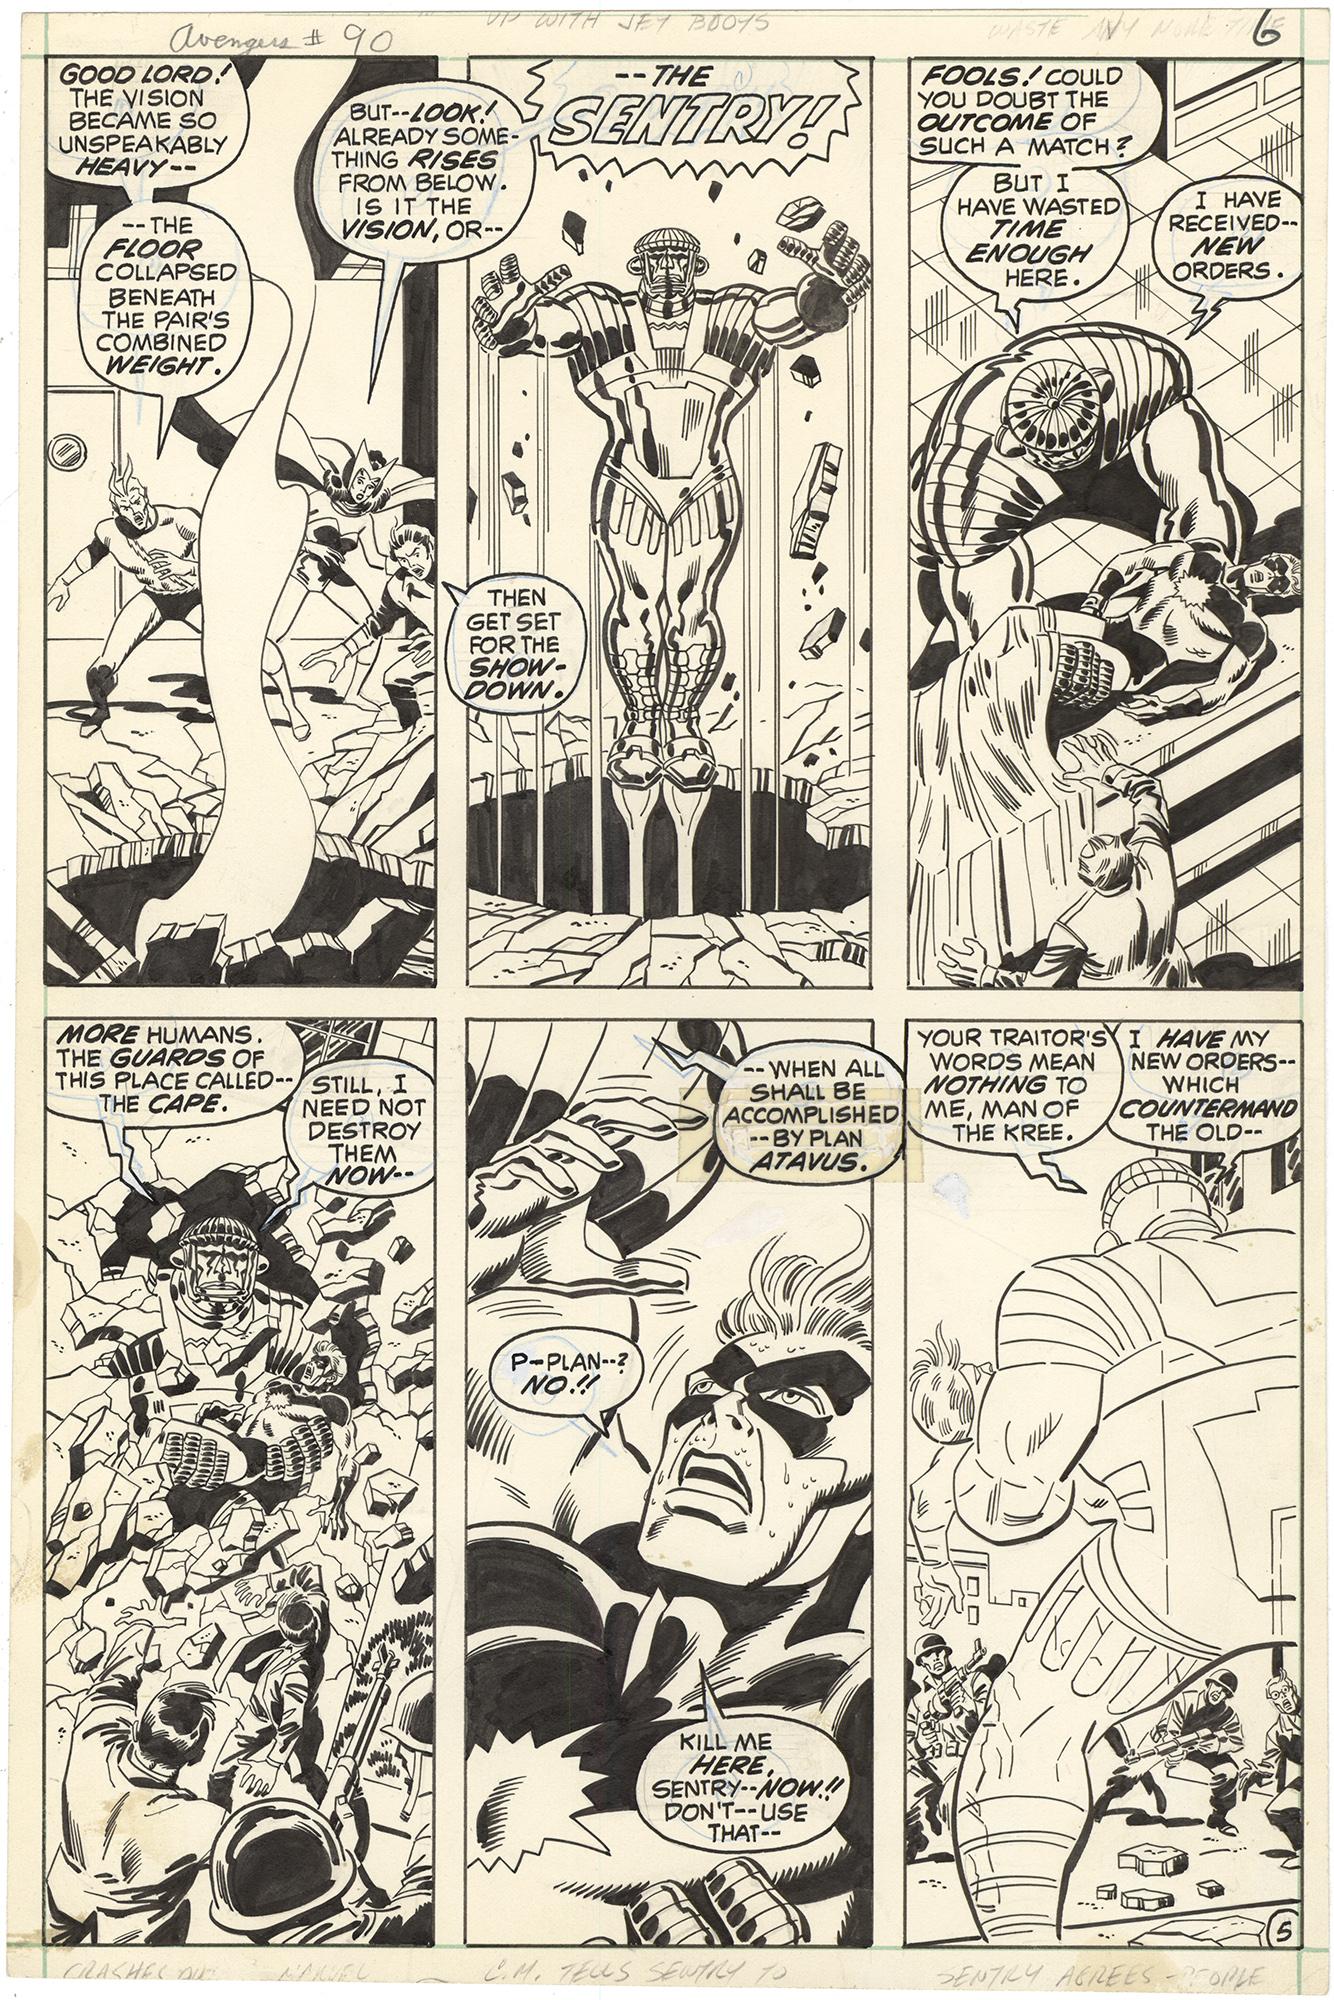 Avengers #90 p5